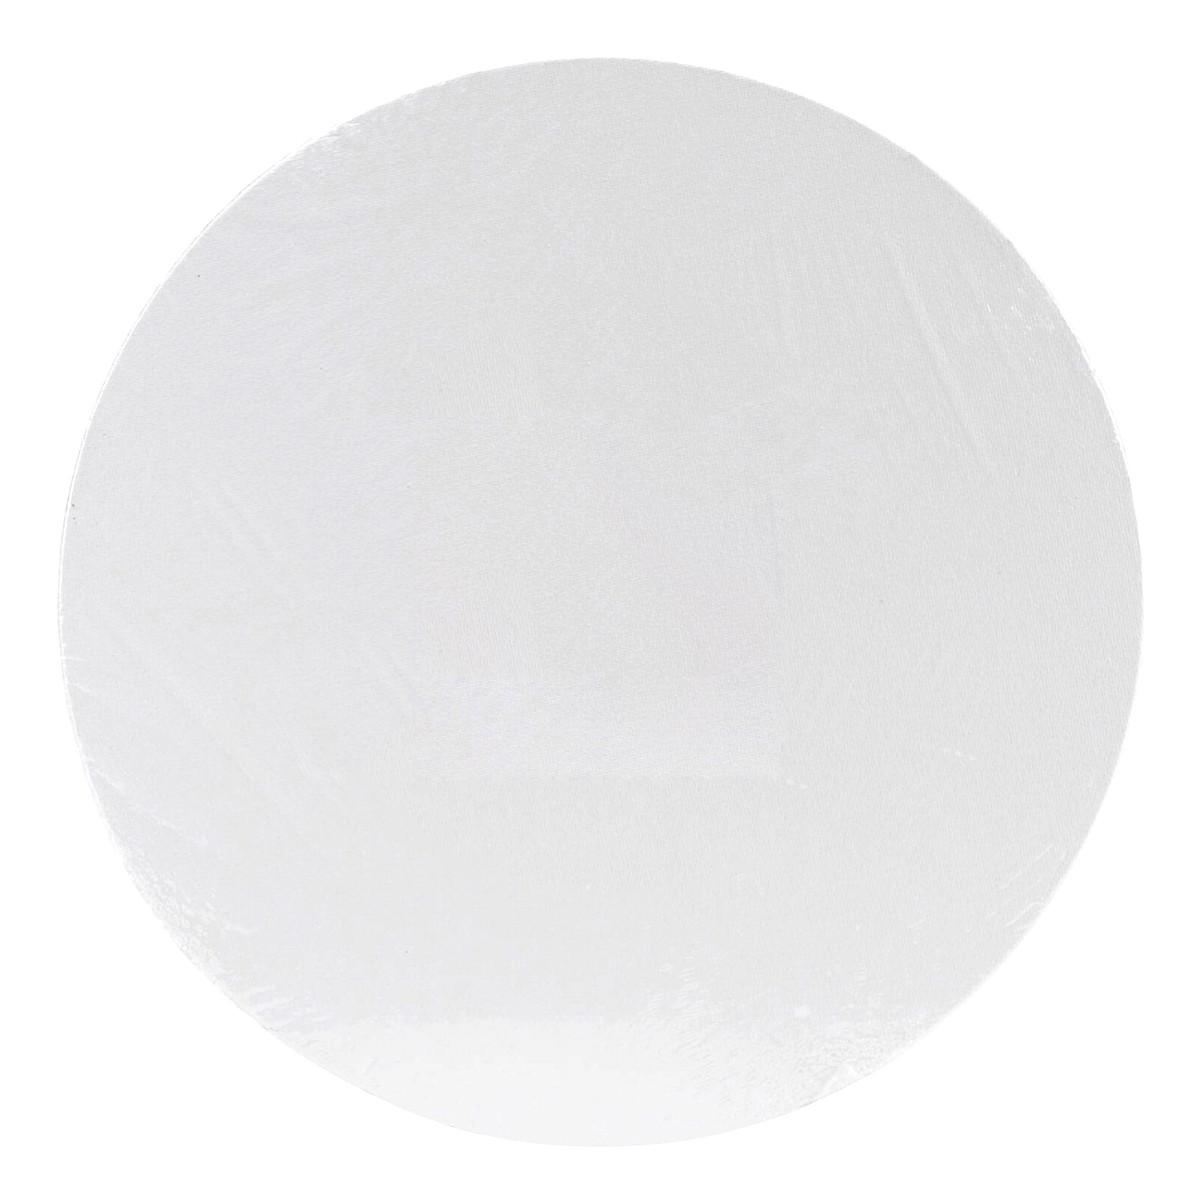 Canvas board, pap, runde, Ø 40 cm